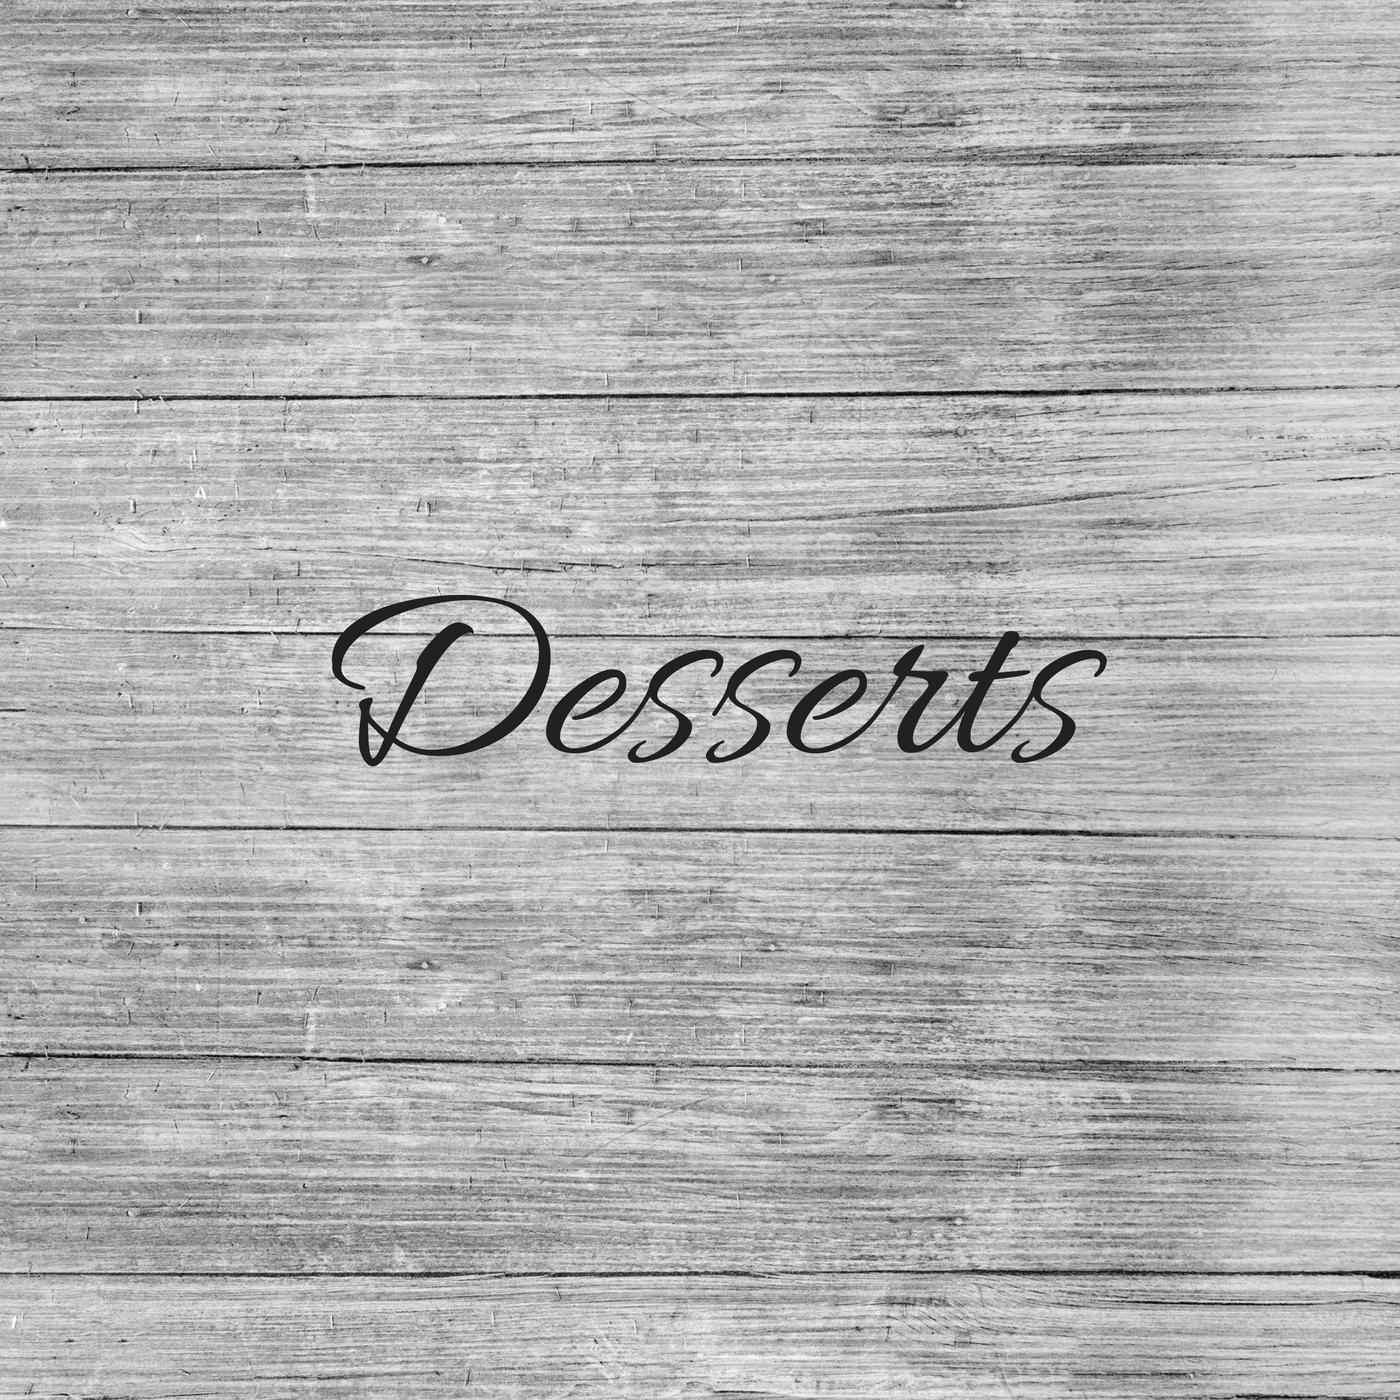 Desserts grey.jpg